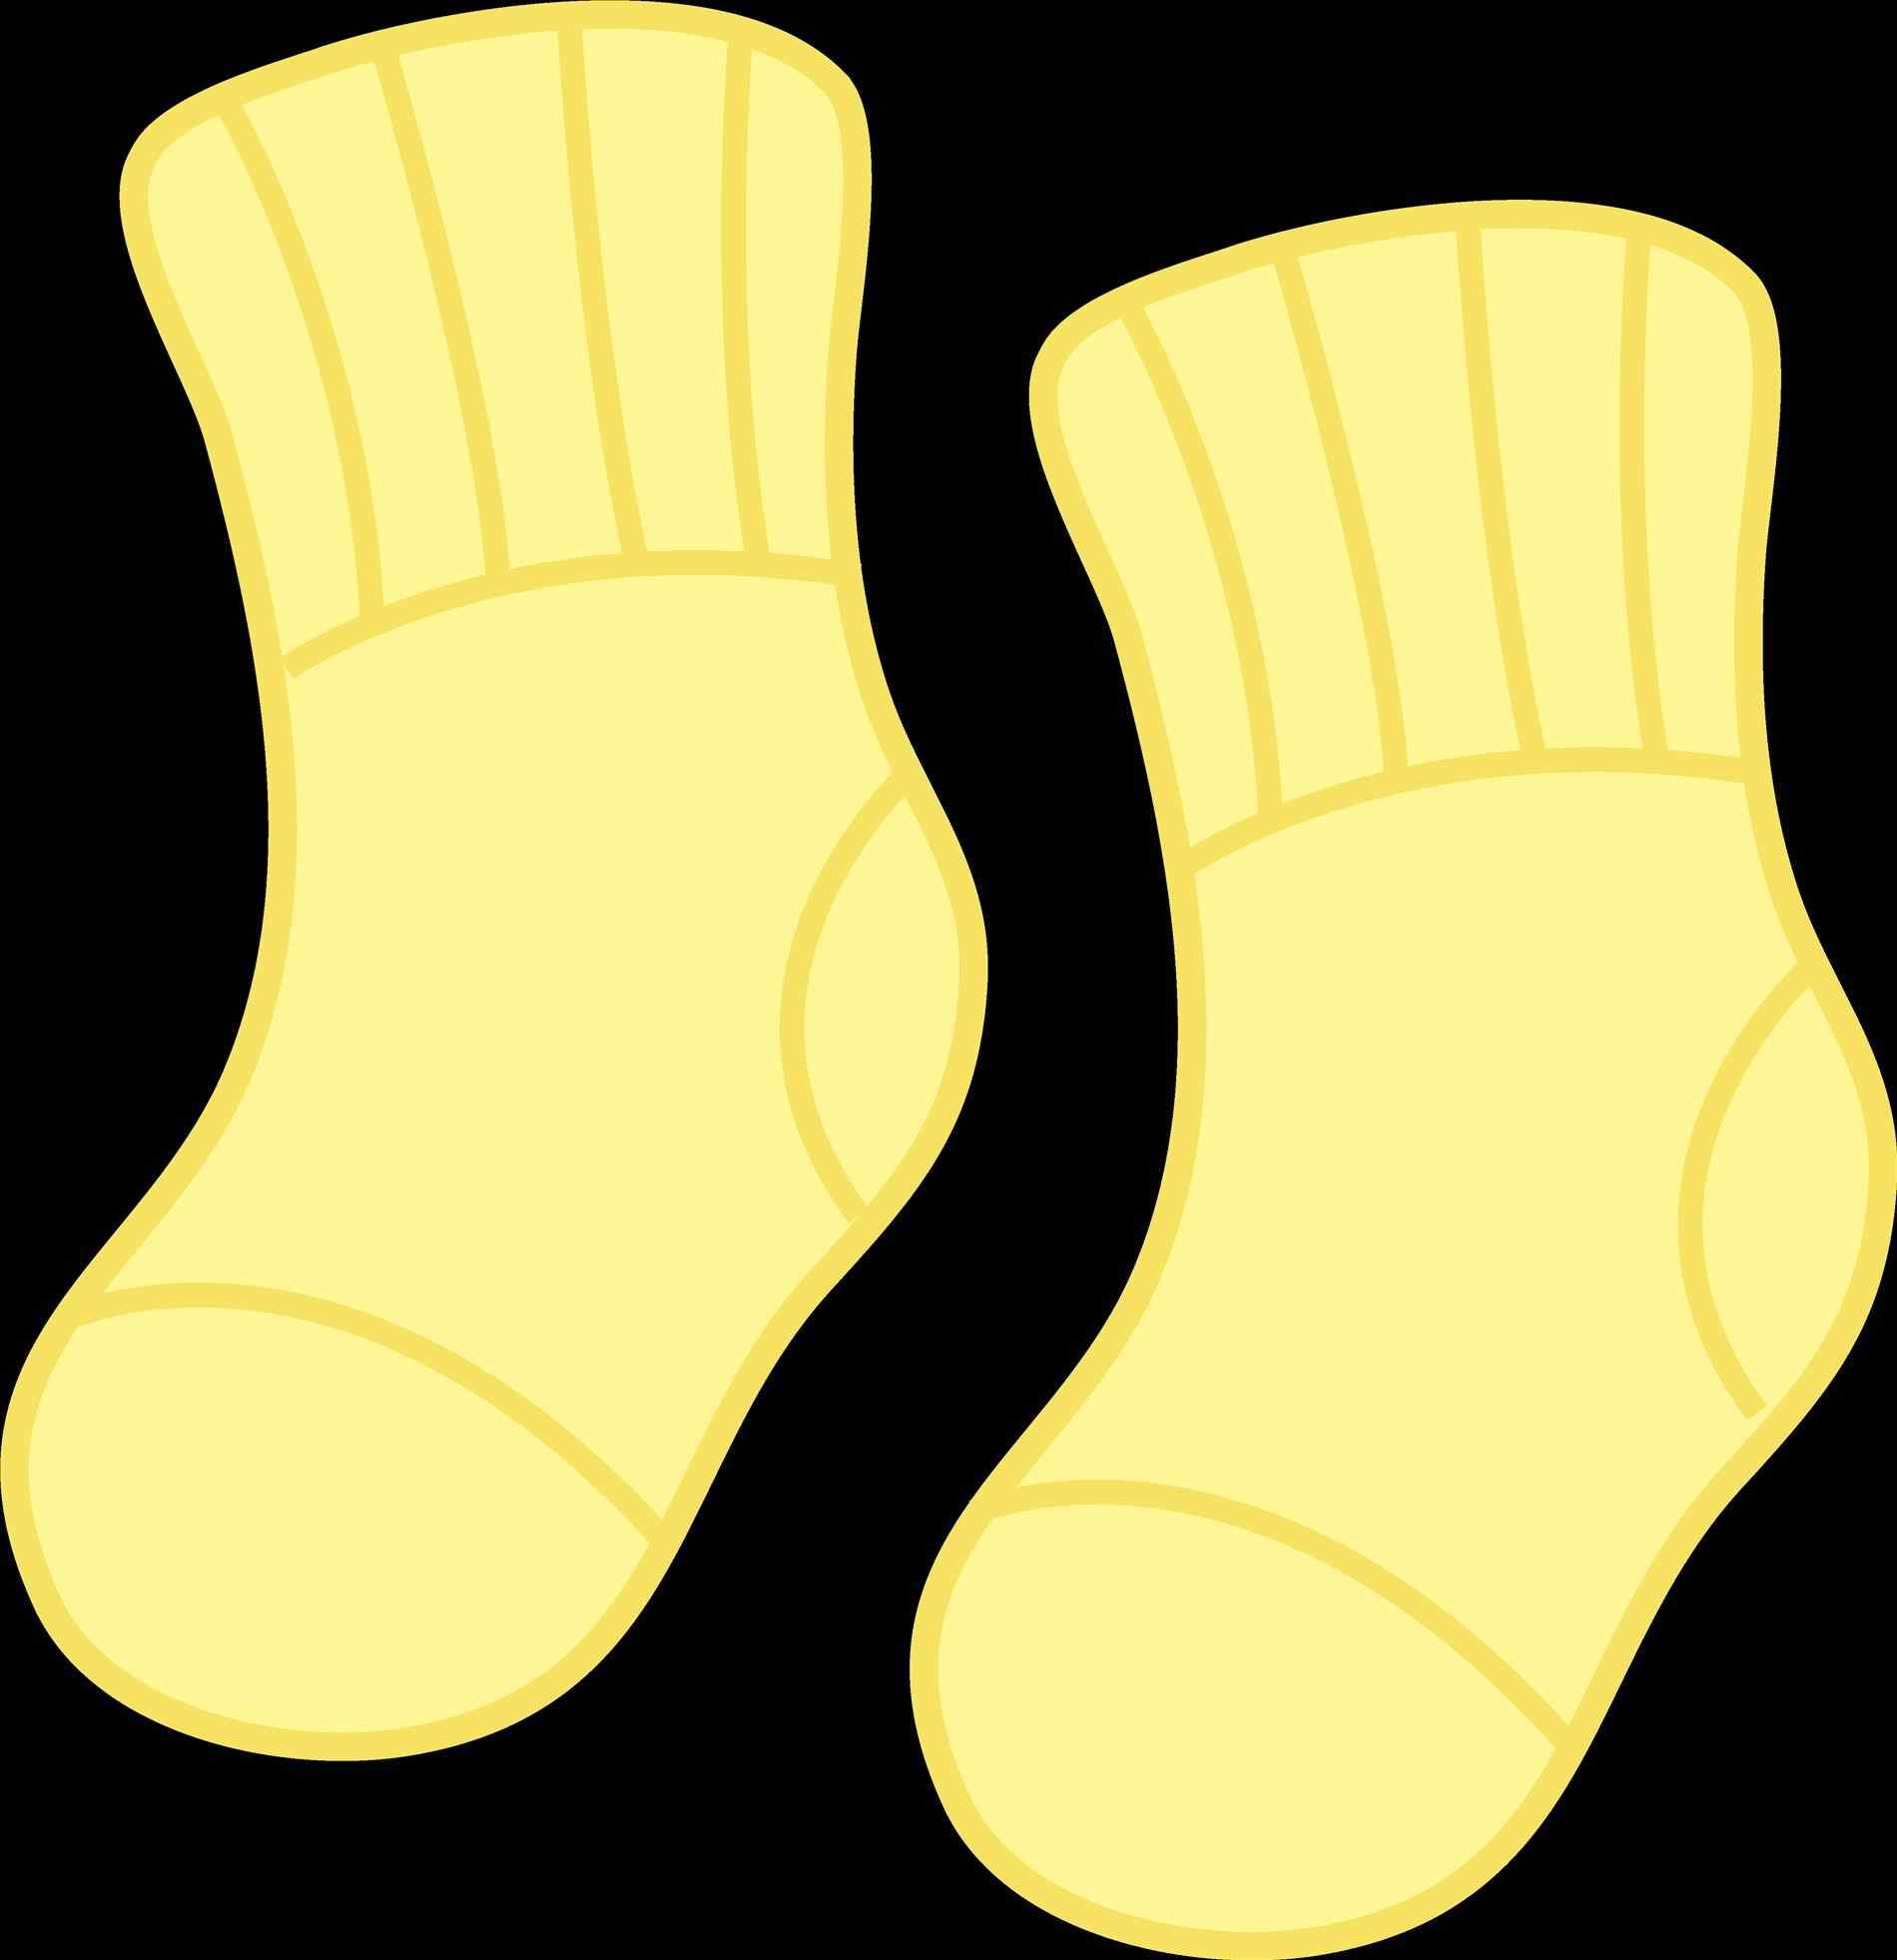 1900x1963 Socks Clip Art Menus From Charles Tyrwhitt Ctshirts Py Planning